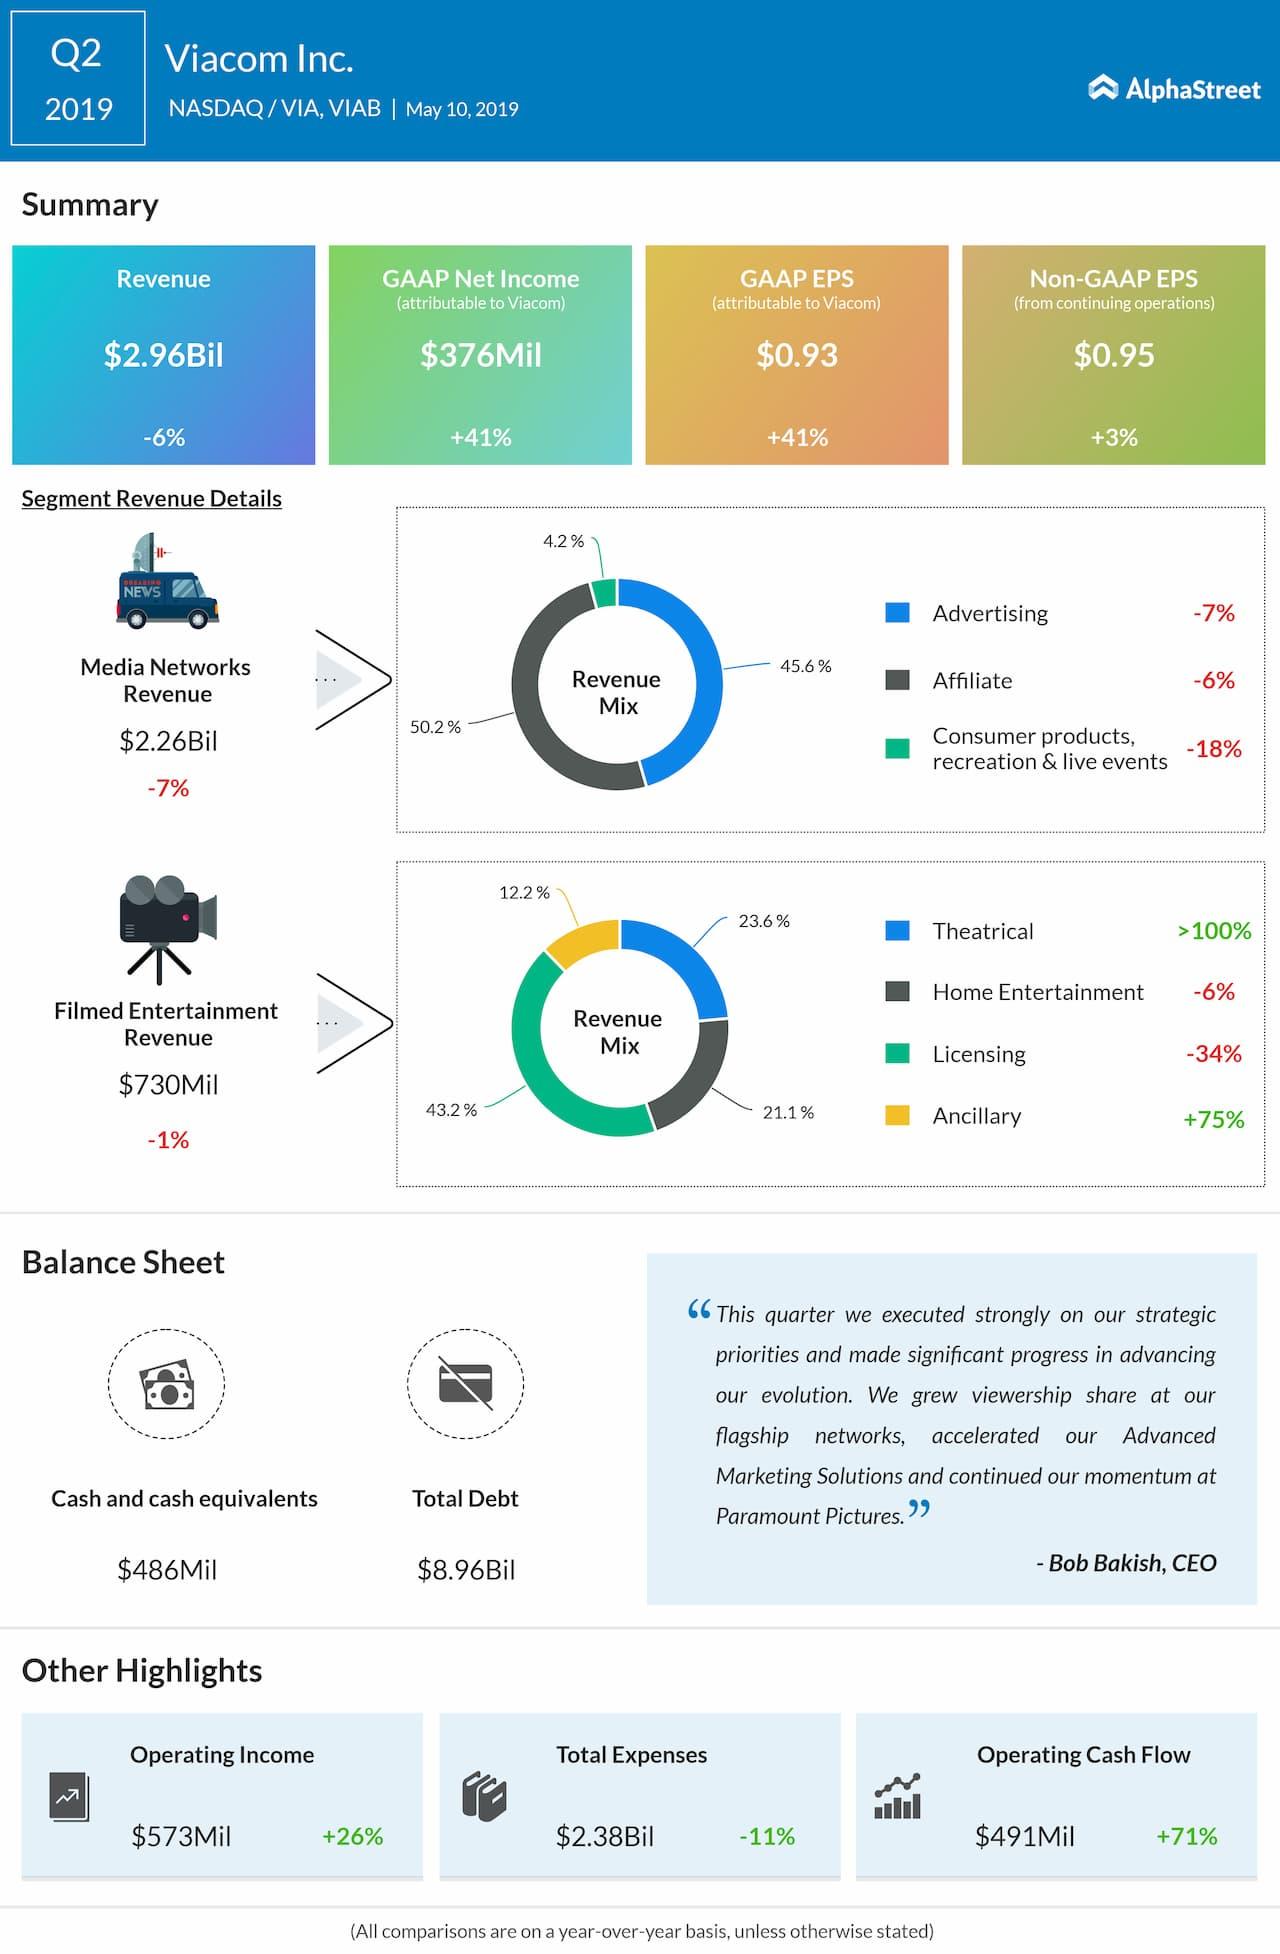 Viacom second quarter 2019 earnings snapshot